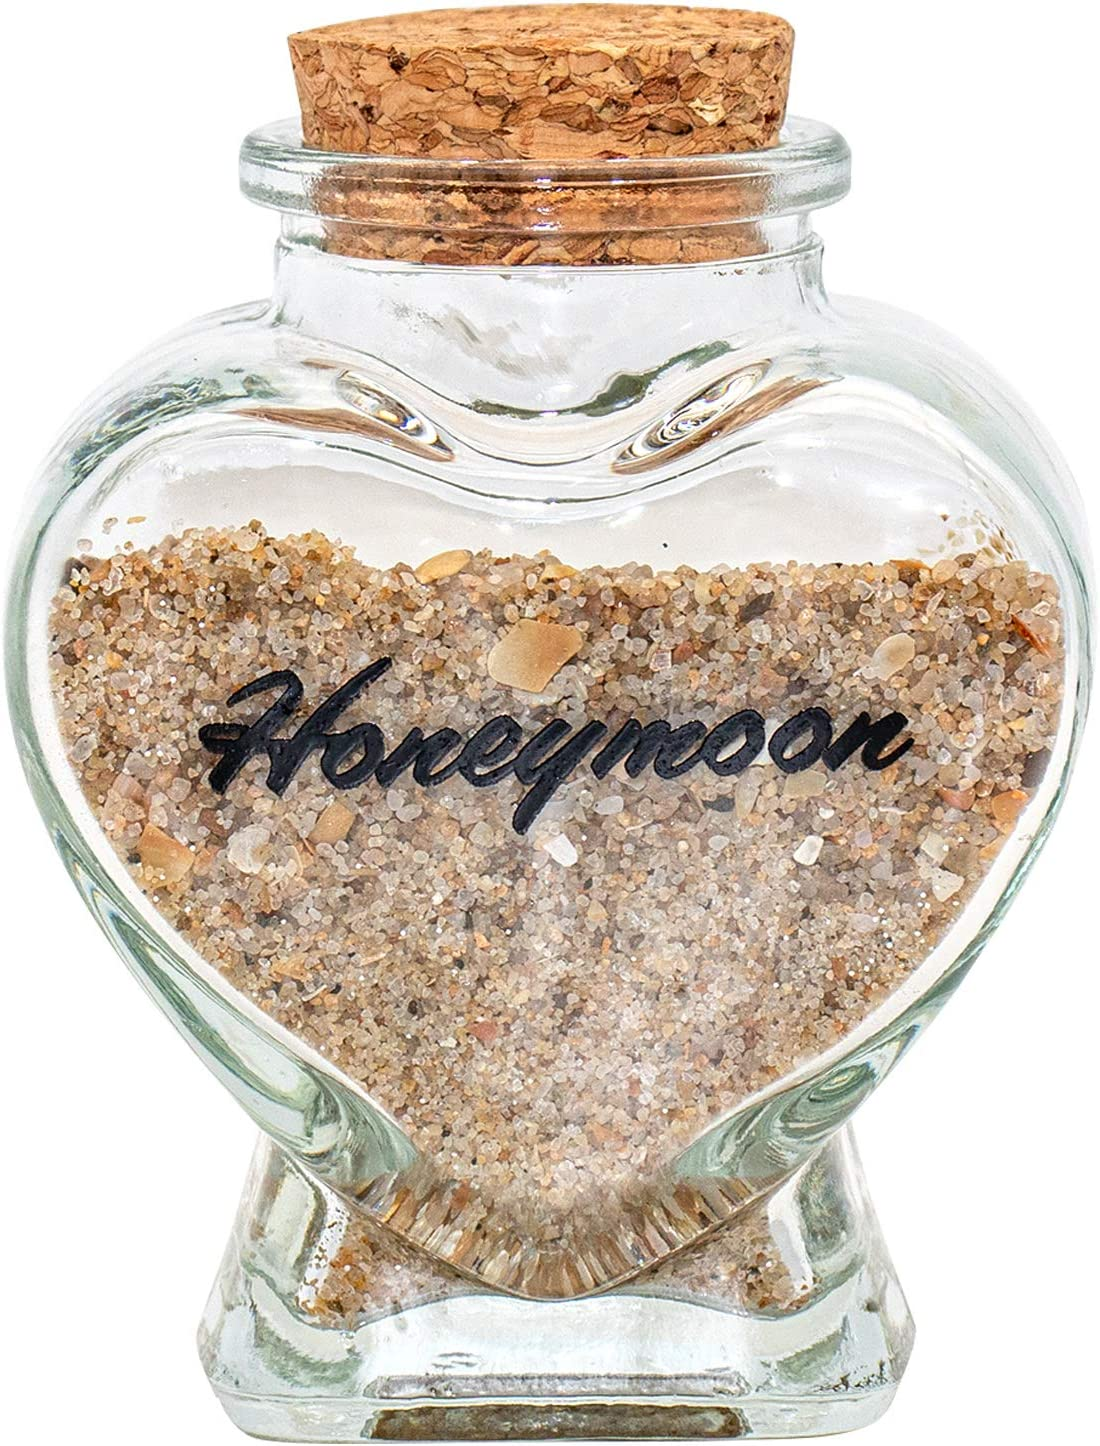 Honeymoon Sand Keepsake Jar - Honeymoon Gifts for Newlyweds Couple,Wedding,Engagement Vacation Travel - Wedding Gifts for Couple with Unique Romantic (HEART SHAPED JAR)